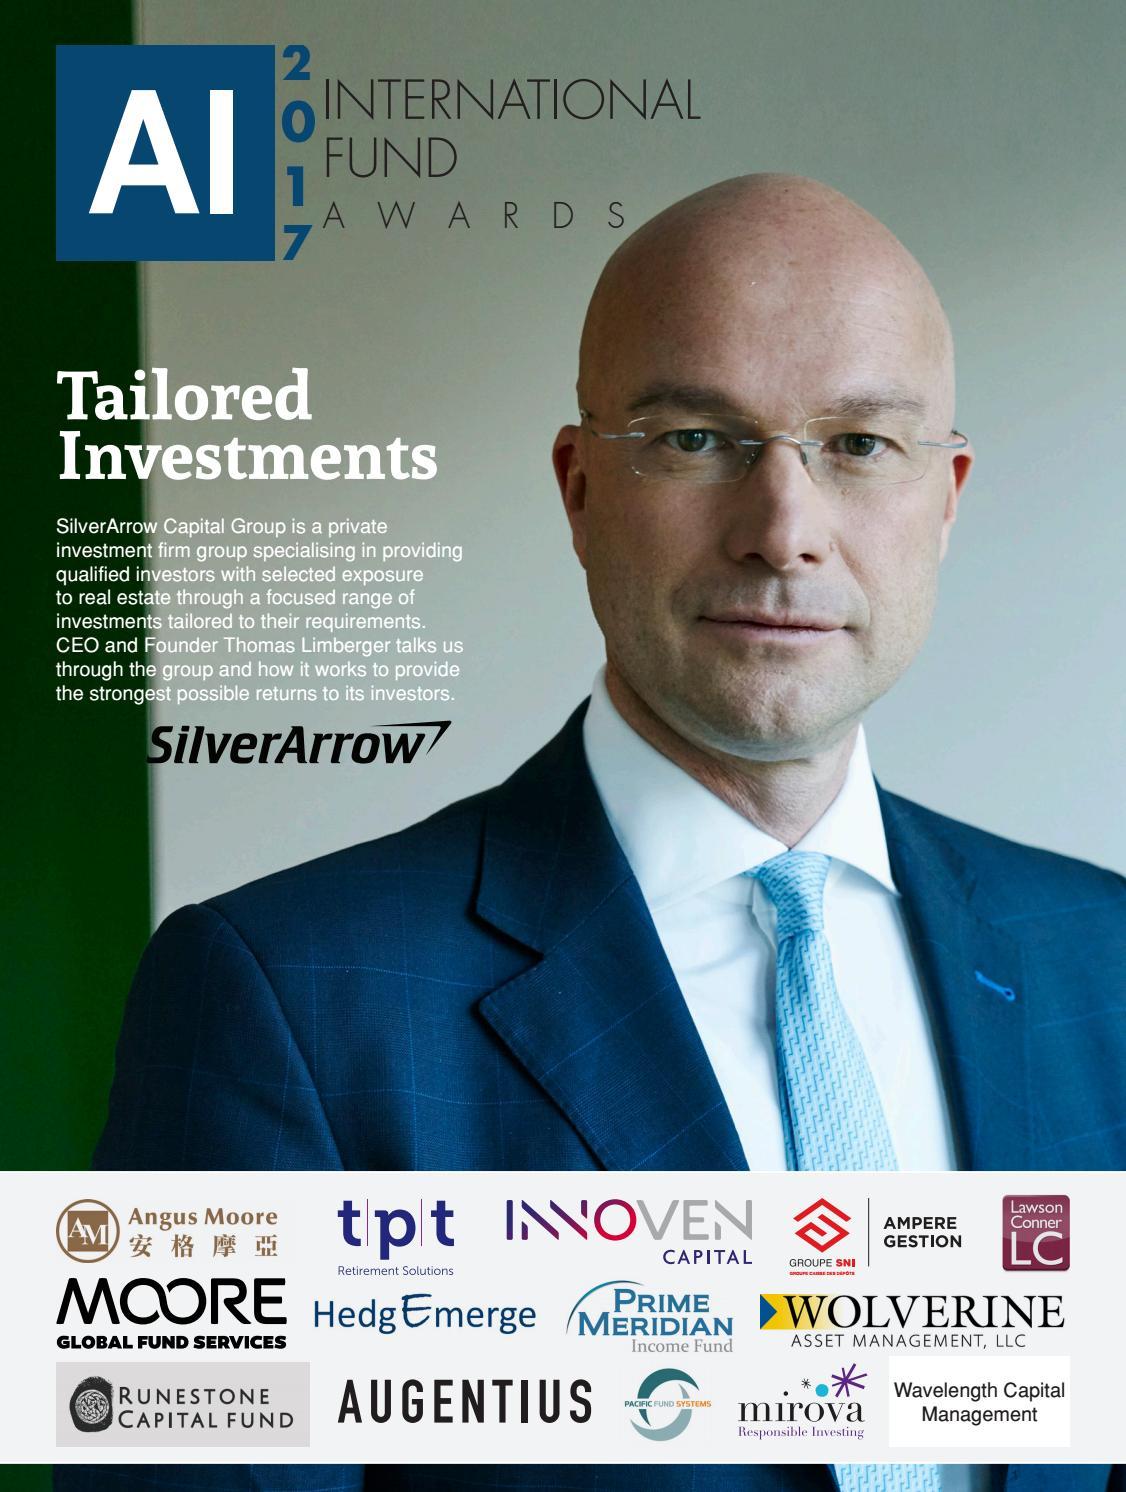 AI International Fund Awards 2017